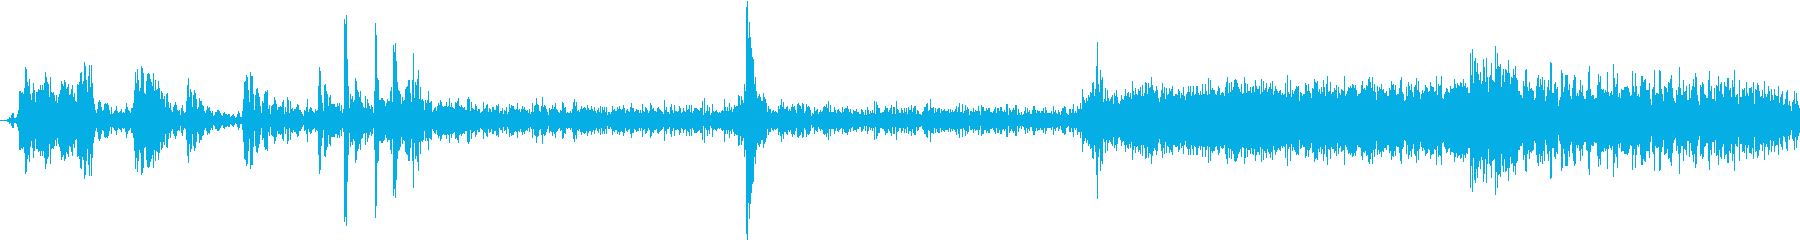 SciFi EC01_88_4の再生済みの波形